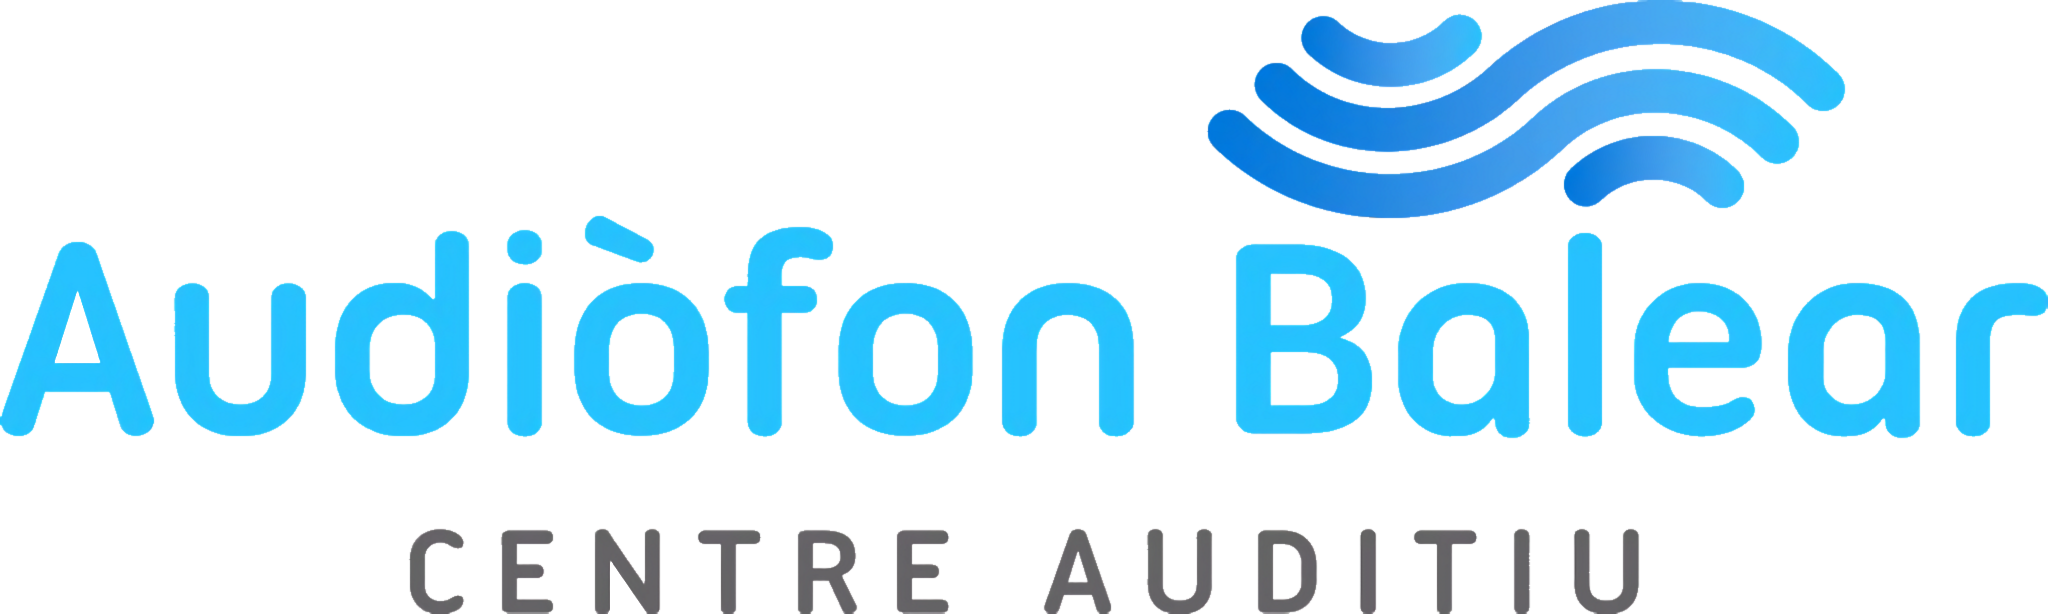 Audiòfon Balear Logo